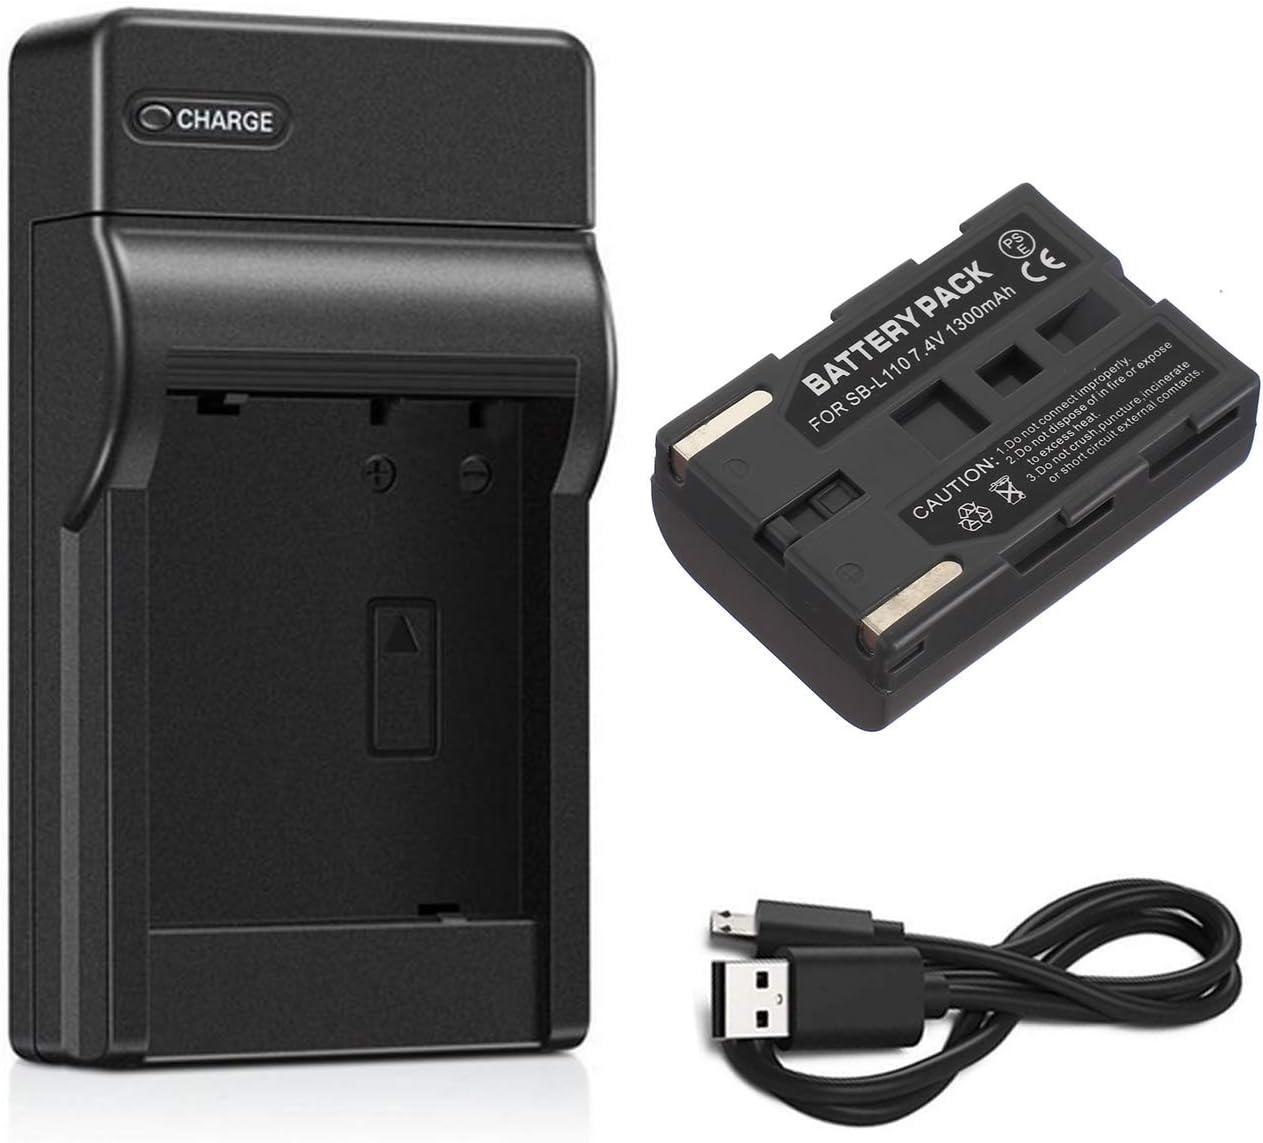 SC-D75 SC-D73 SC-D77 Digital Video Camcorder SC-D71 Battery Pack for Samsung SC-D70